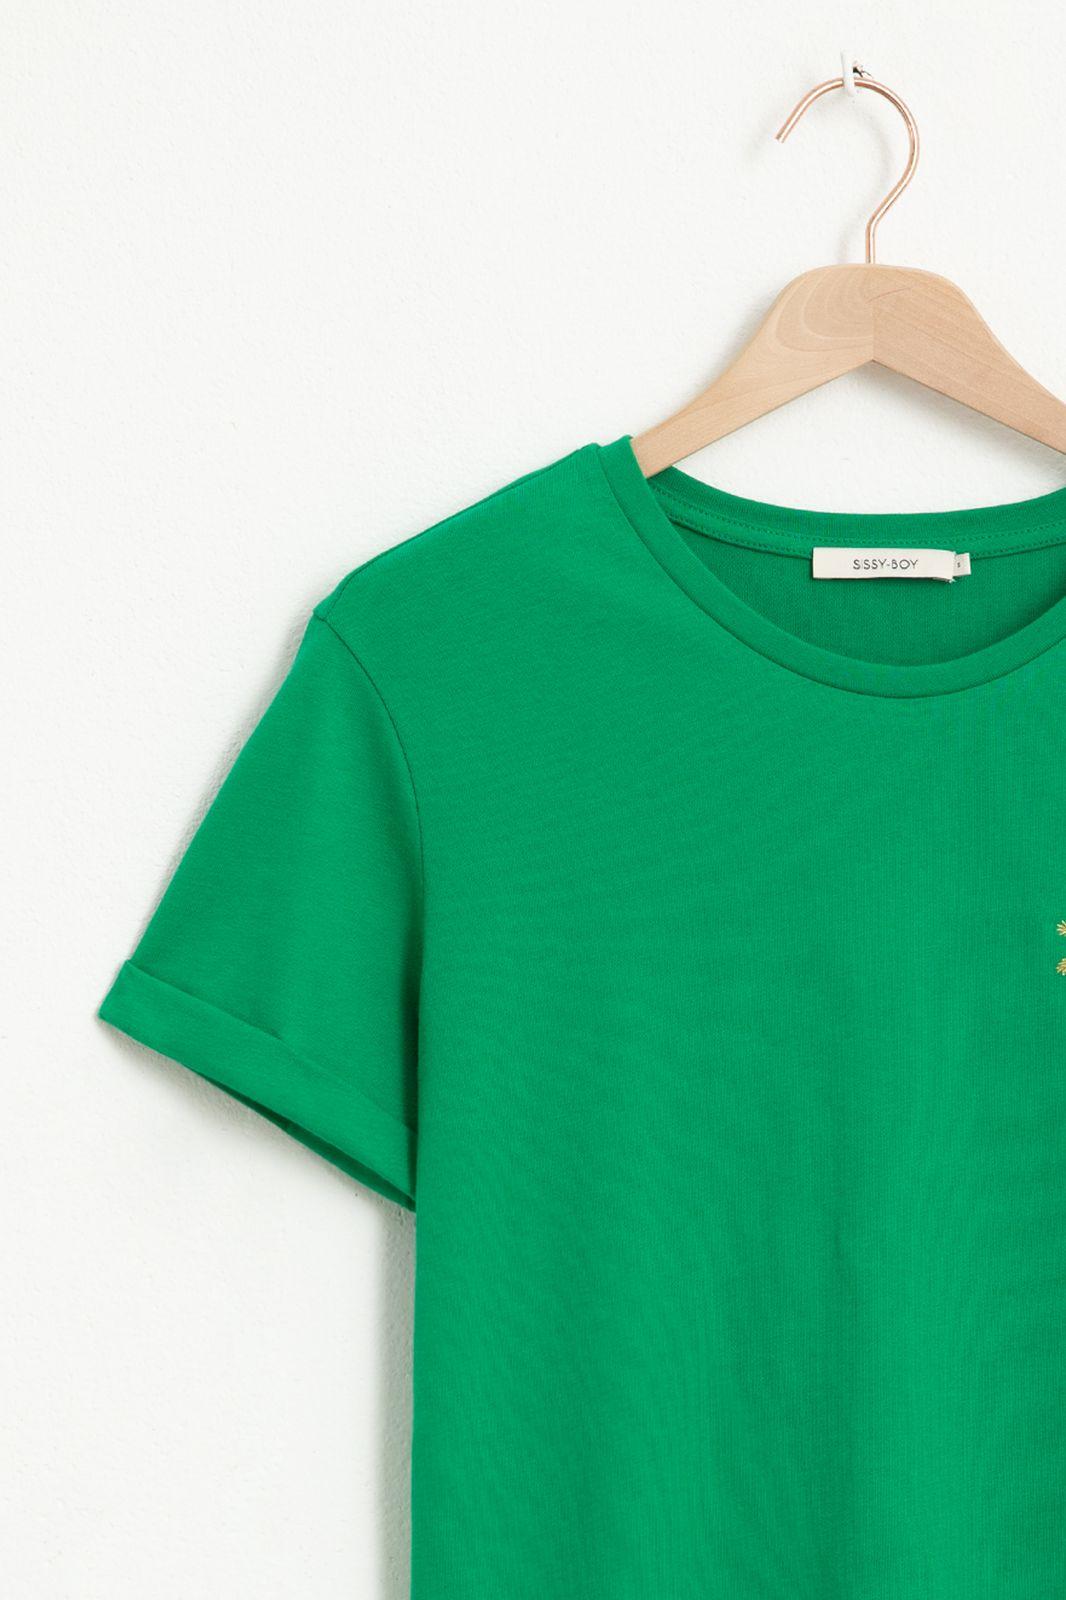 Groen T-shirt met palmboom embroidery